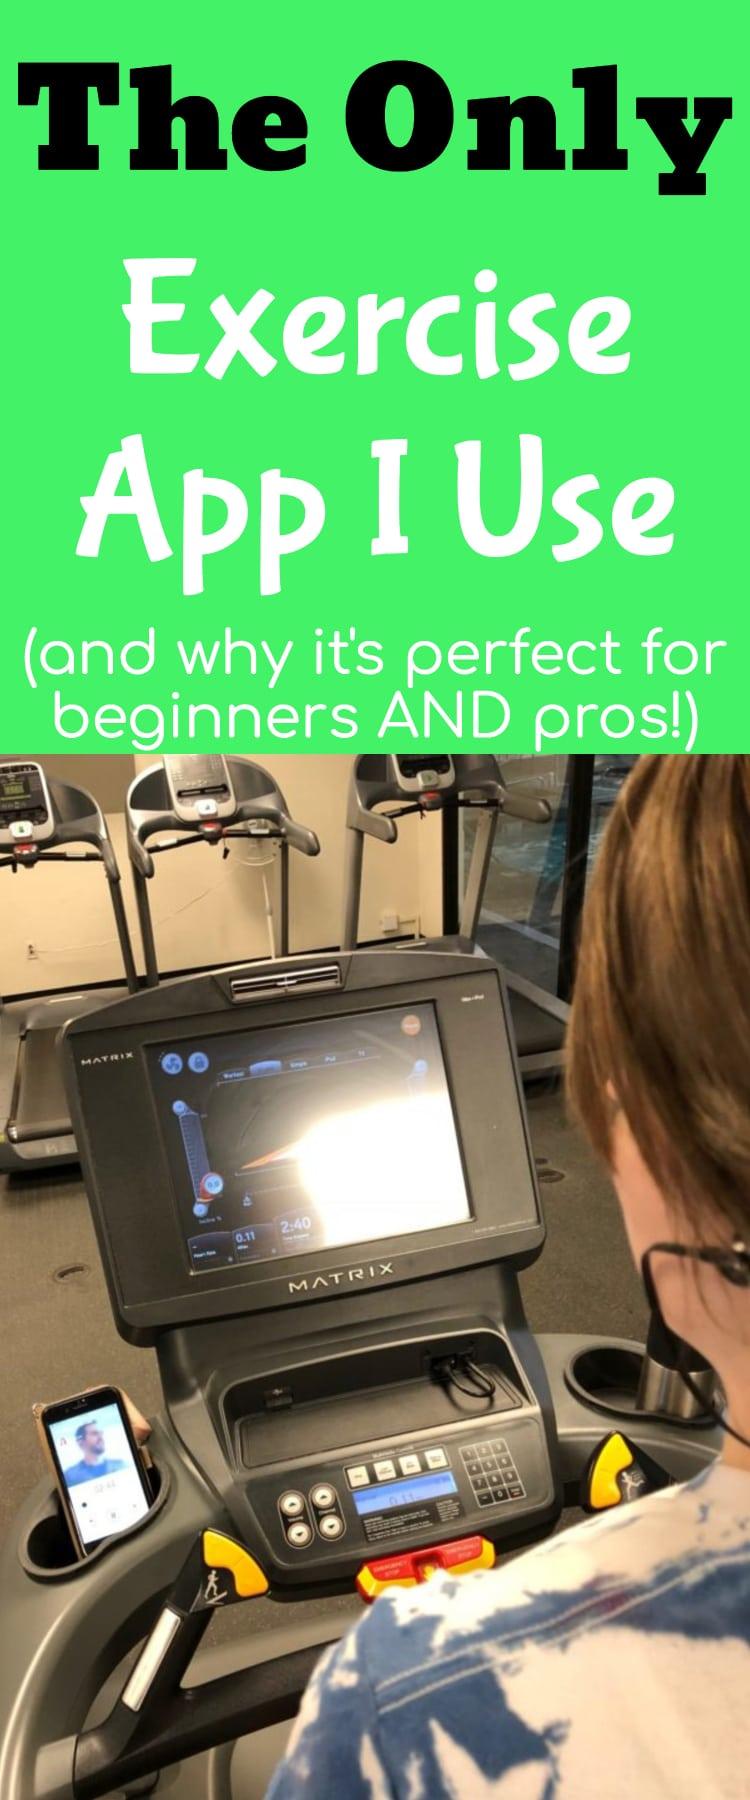 aaptiv / fitness app / exercise app / healthy app / easy exercise / exercise for beginners / beginning fitness / prenatal exercise #exercise #fitness